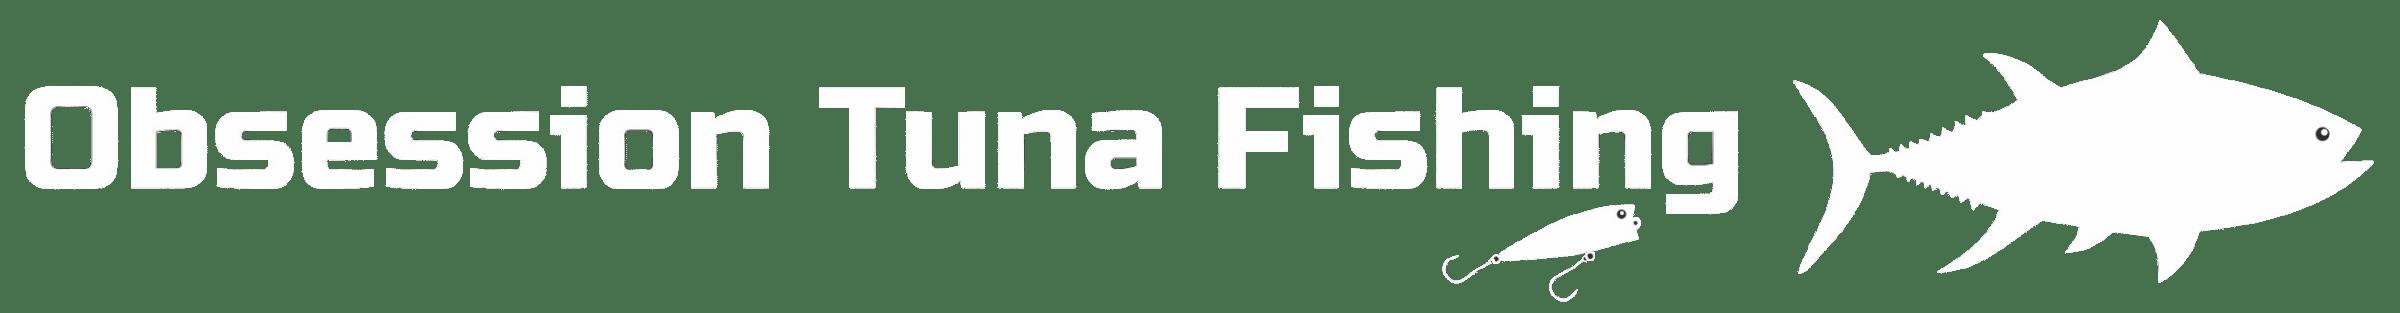 Obsession Tuna Fishing